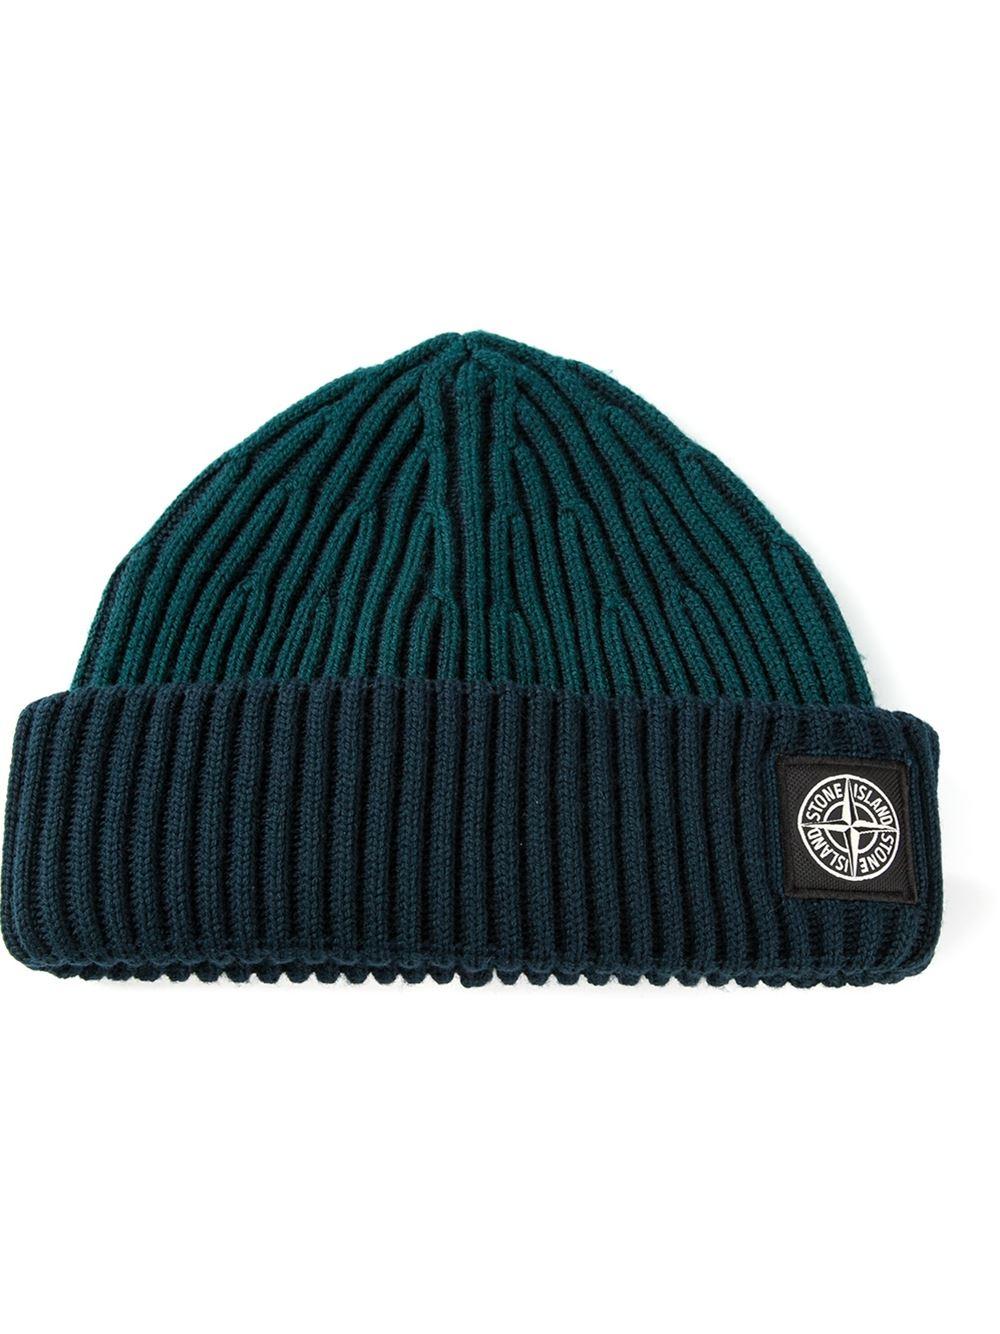 9fe3fb1a46f ... mens grey rib knit 5915N09C6 beanie hat SI3015  wide range 968f8 d54ef Stone  Island Grey Two Tone Beanie Hat ...